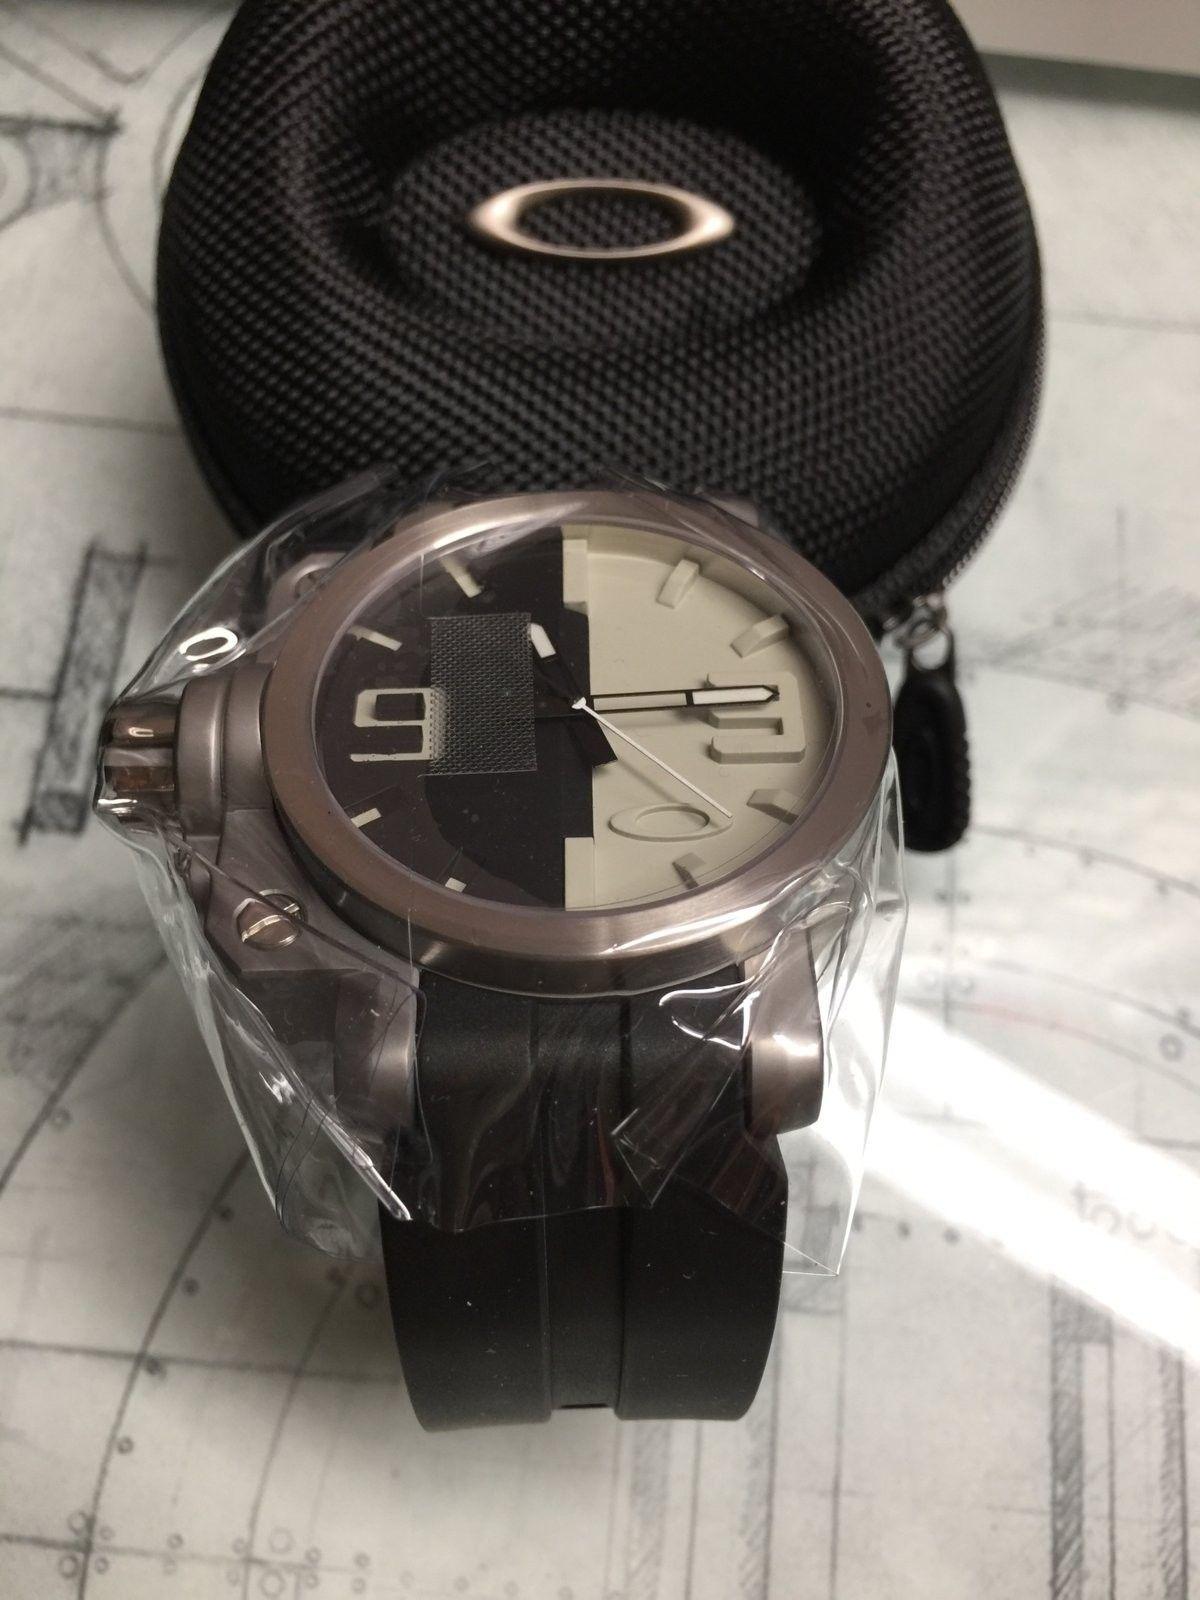 BNIB Brushed/Black/Tan GEARBOX watch - IMG_3300.JPG